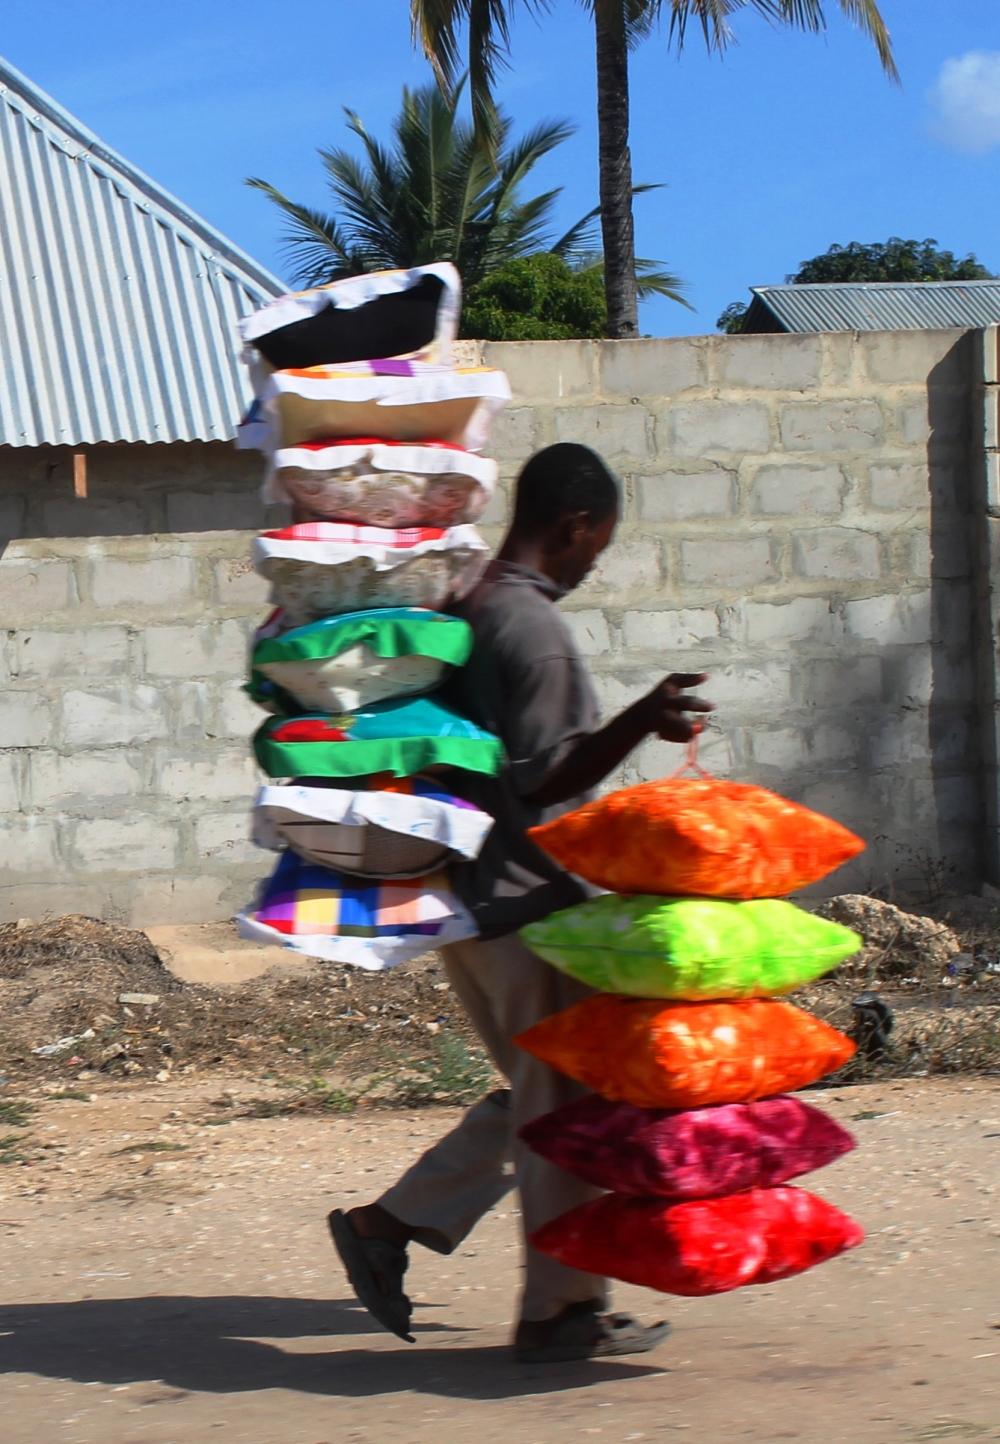 Carrying Cushions in Kigamboni, Dar Es Salaam